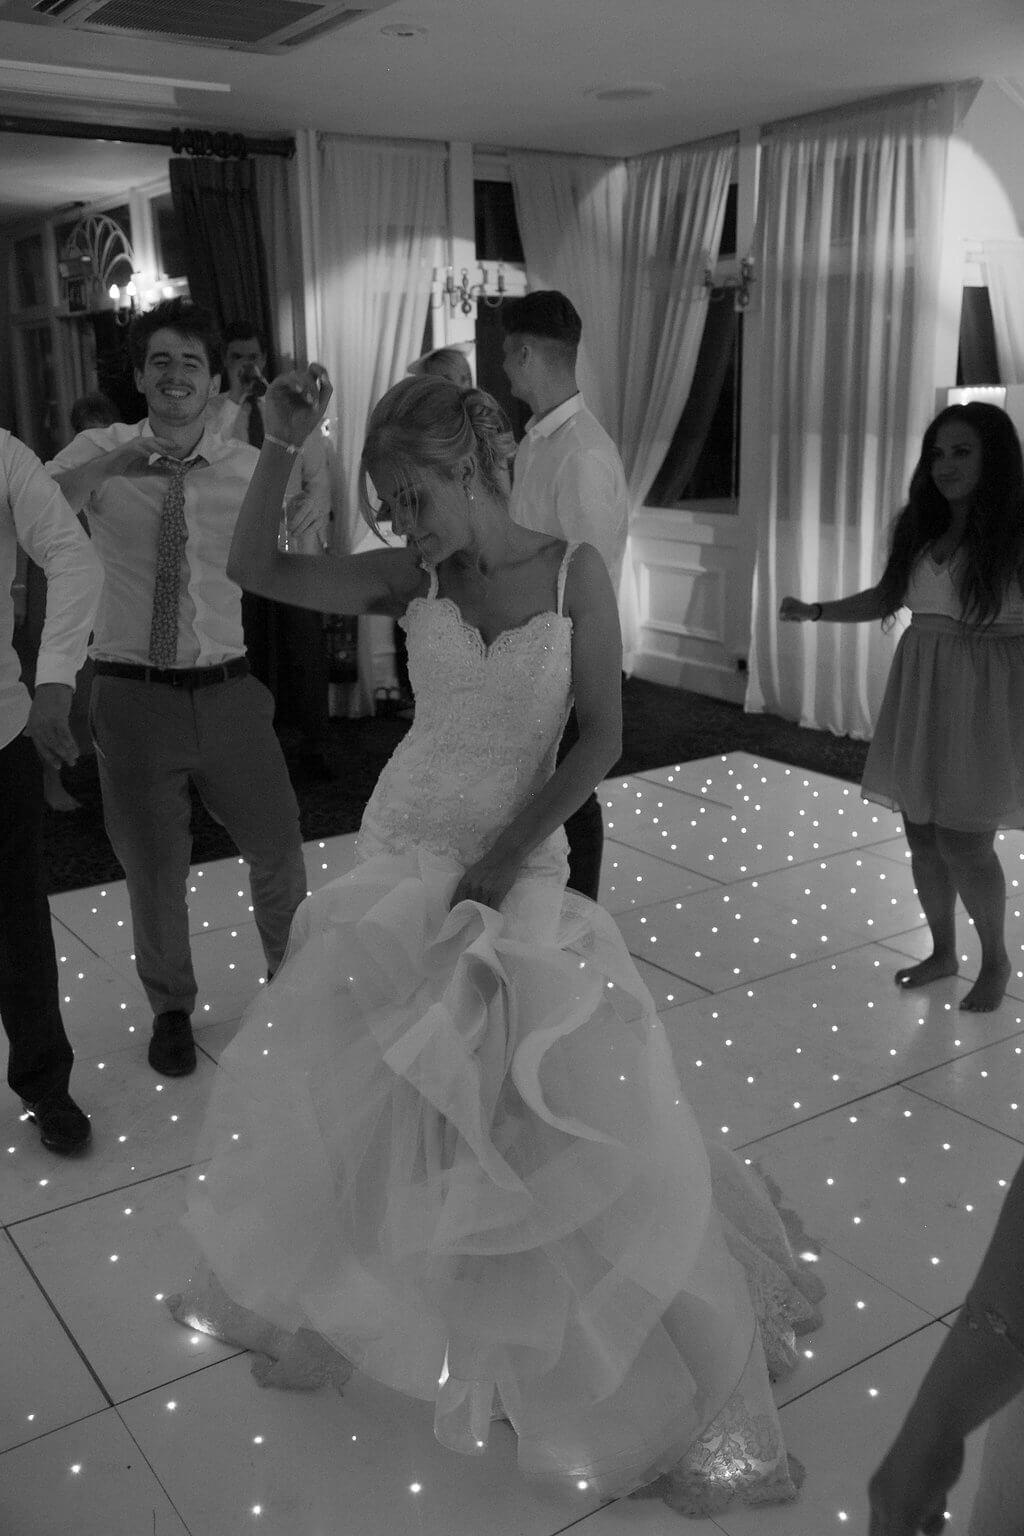 chilston park orangery starlit dance floor